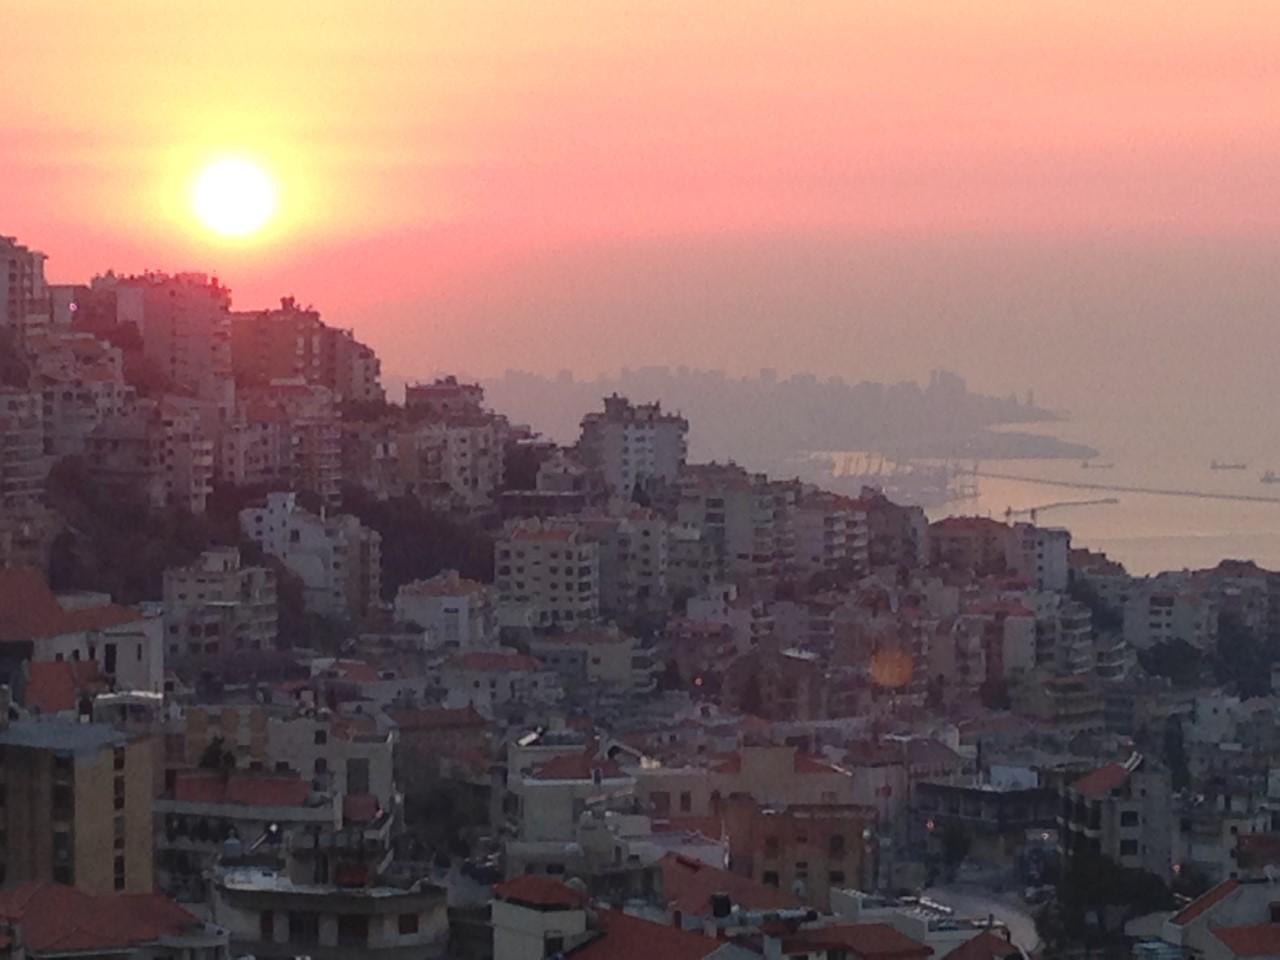 Sunset over Beirut.